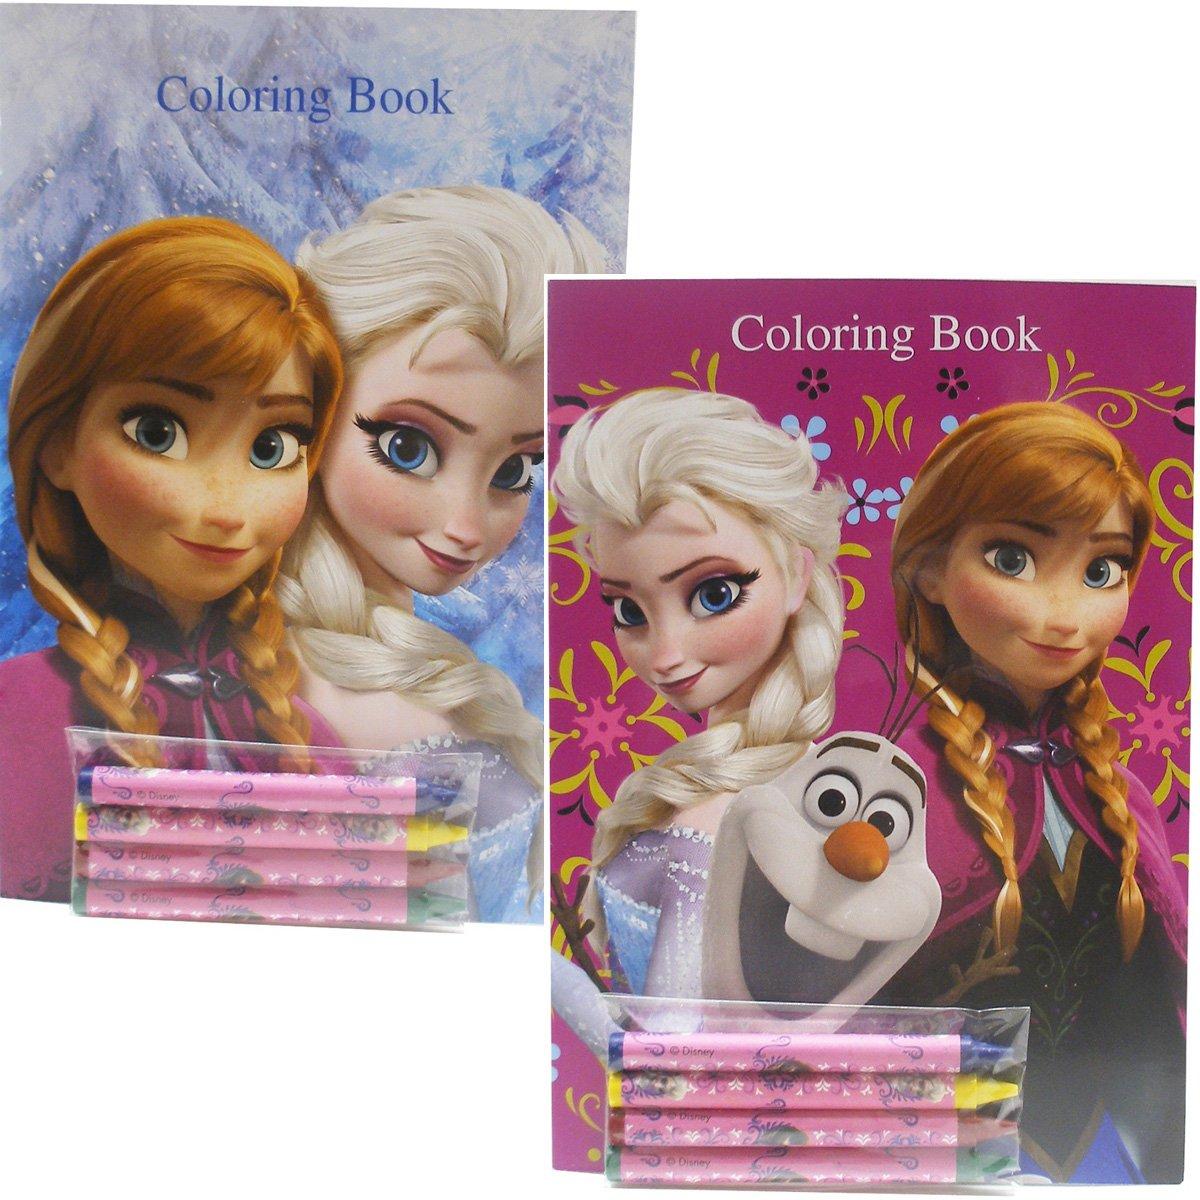 Amazon.com: Disney Frozen Coloring Books Elsa Anna and Olaf (2 Books ...